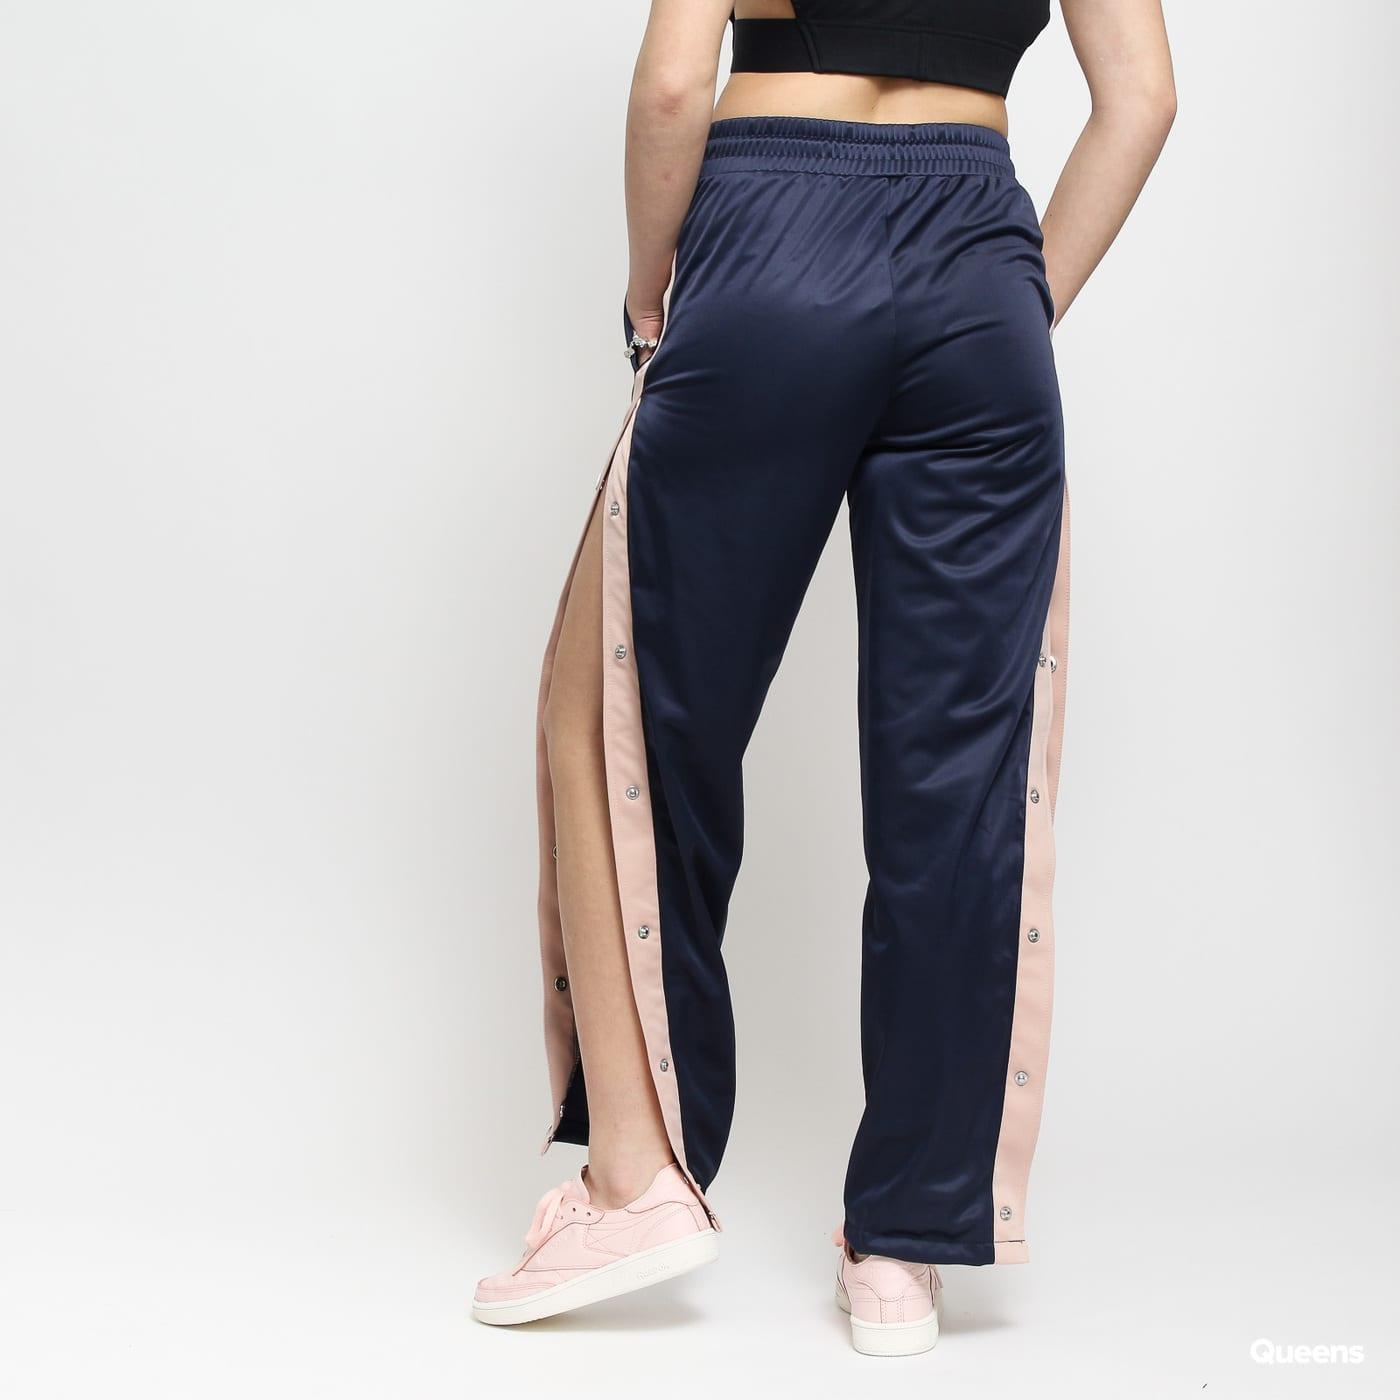 Urban Classics Ladies Button Up Track Pants navy / svetloružové